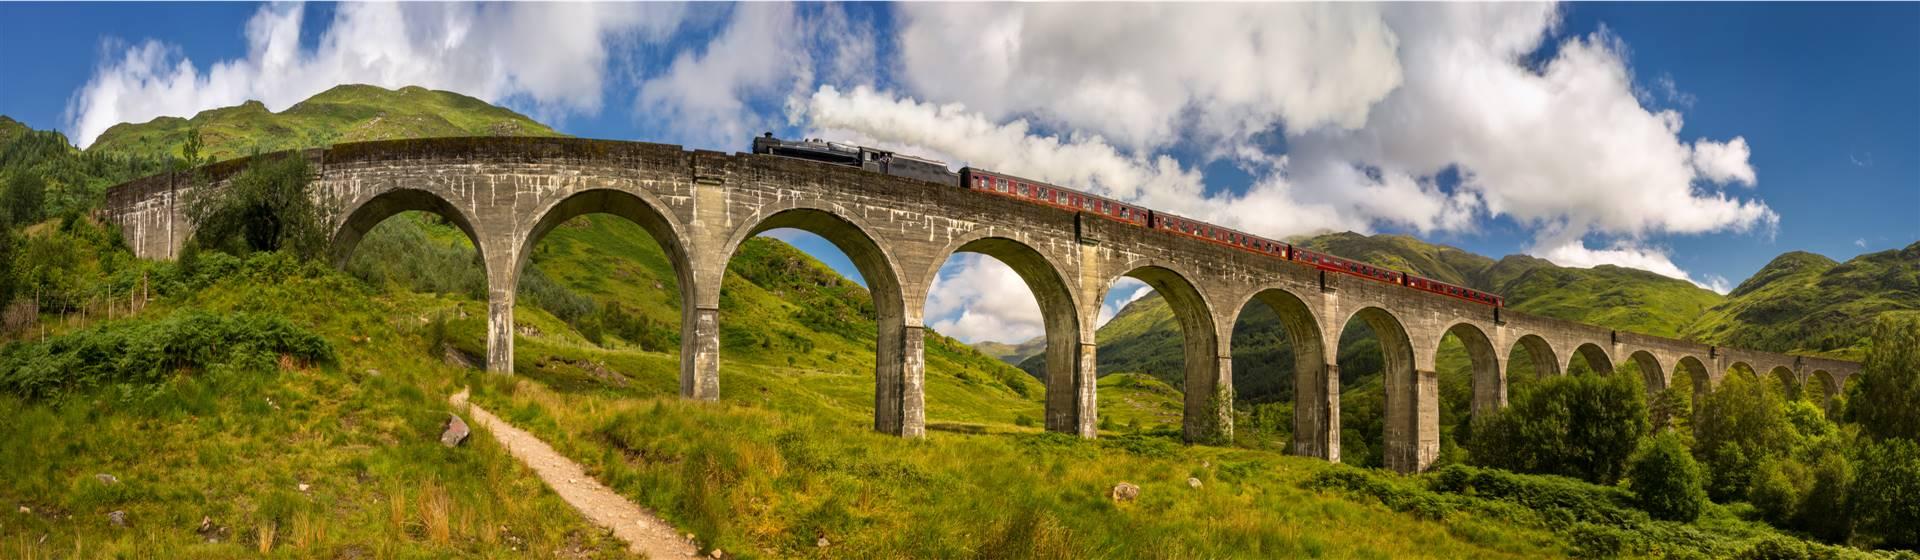 "<img src=""jacobiteonglenfinnanviaductshutterstock.jpeg"" alt=""Jacobite on the Glenfinnan Viaduct""/>"